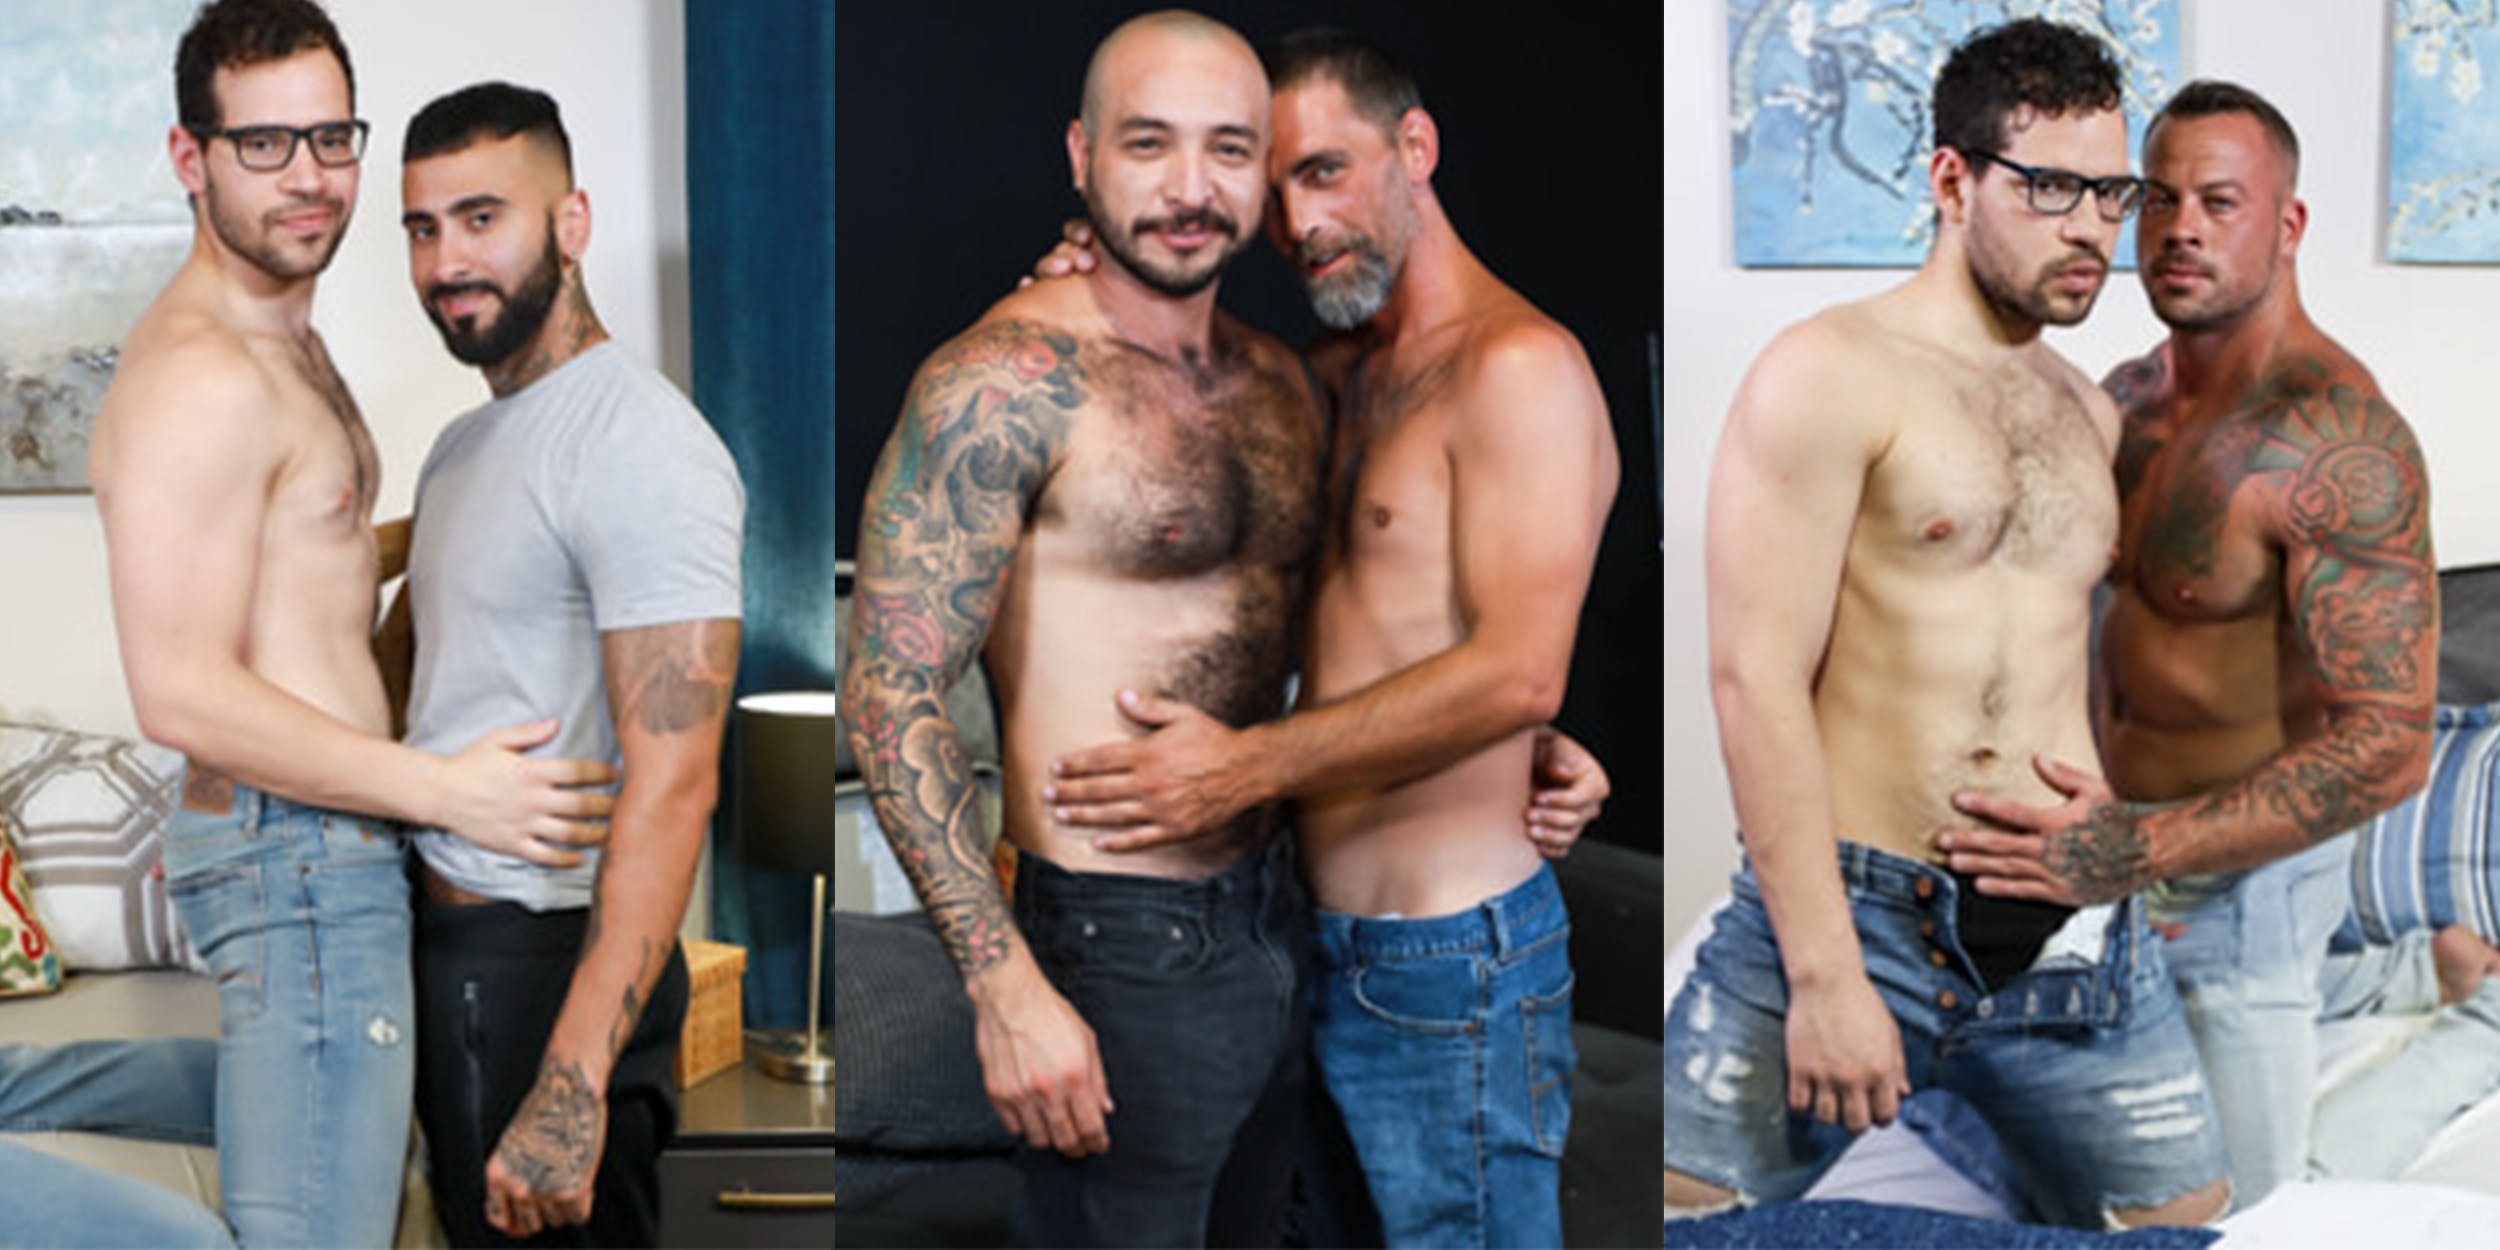 best gay daddy porn - men over 30